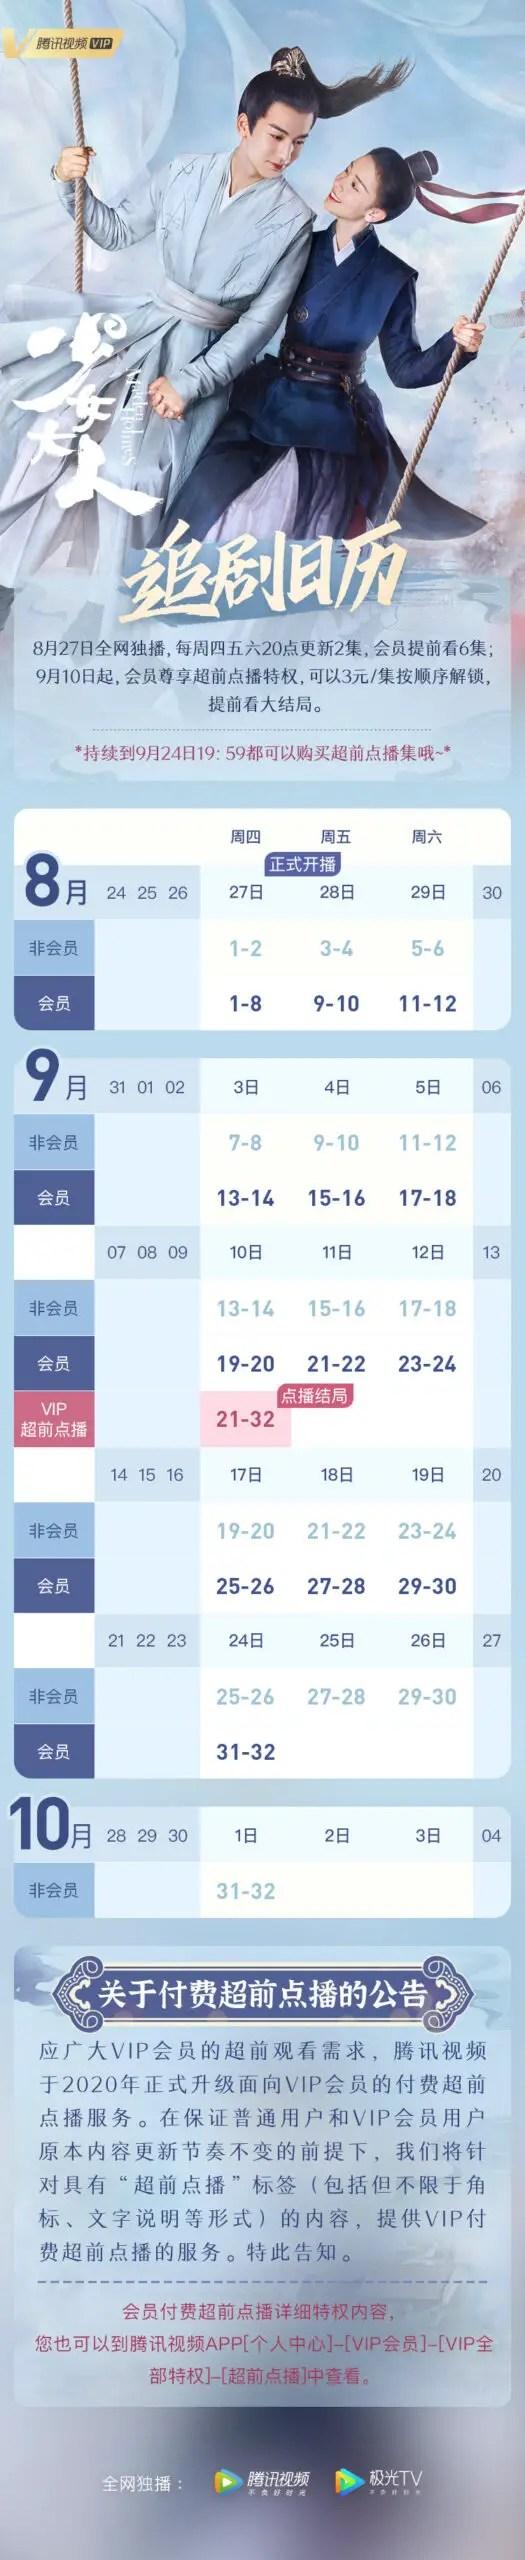 Maiden Holmes Chinese Drama Airing Calendar